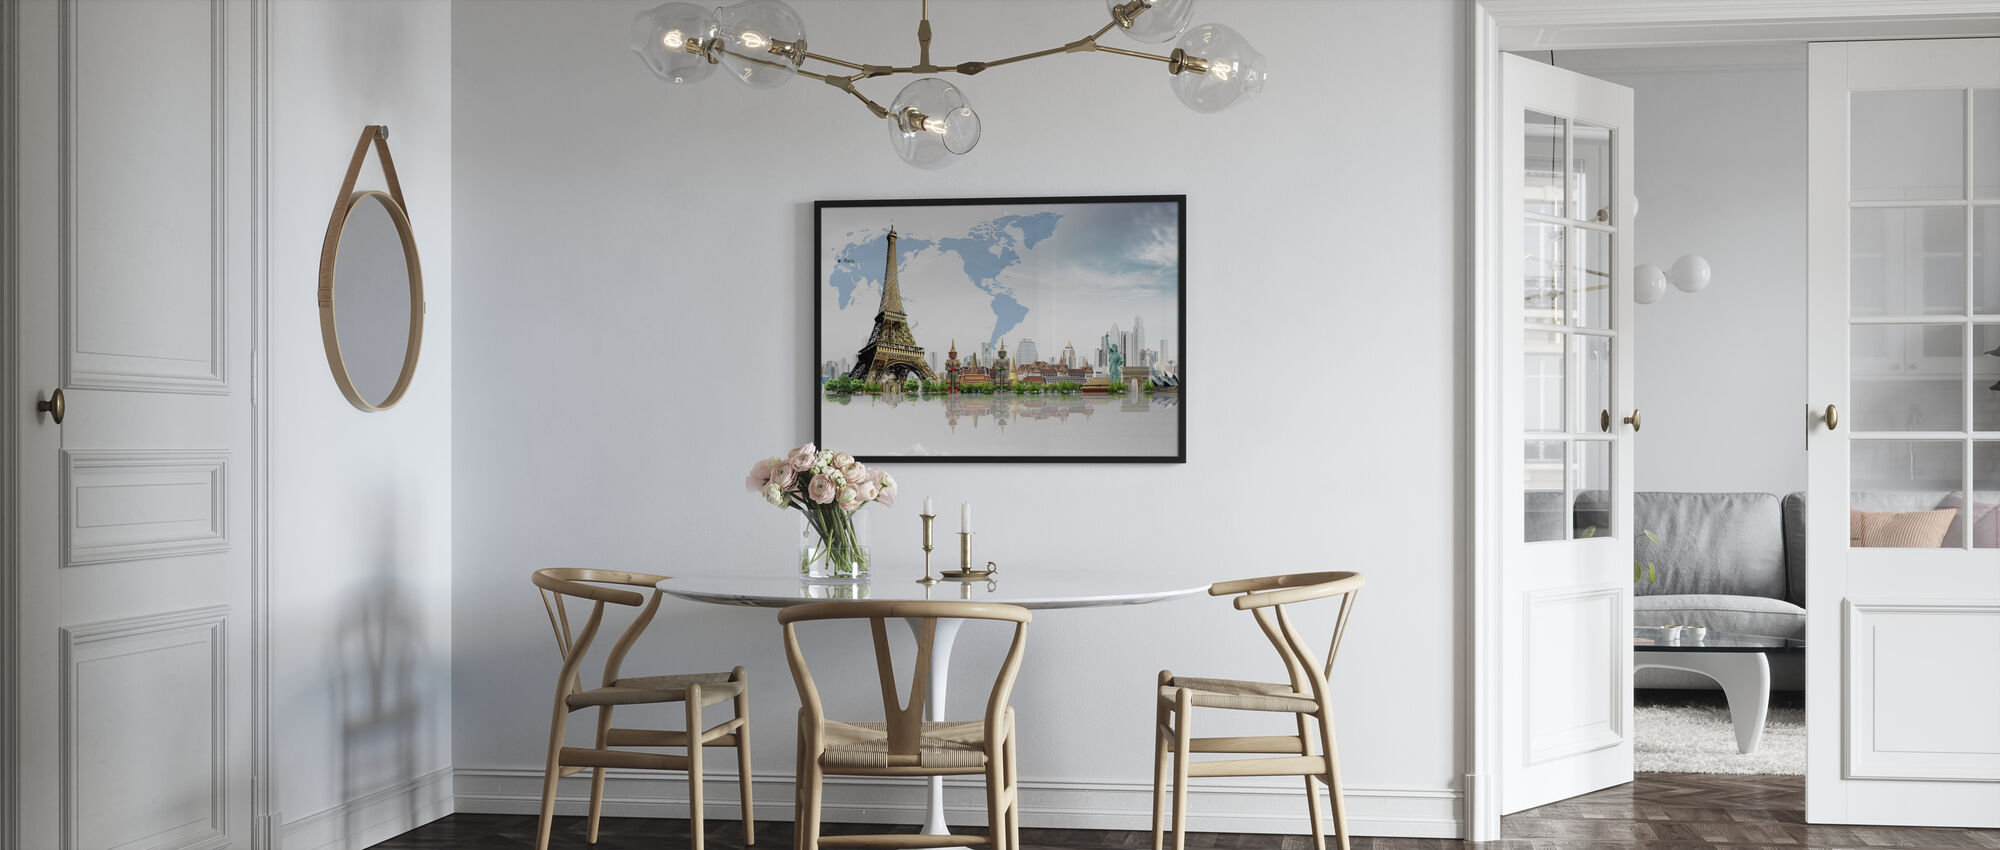 Travel Concept - Poster - Kitchen